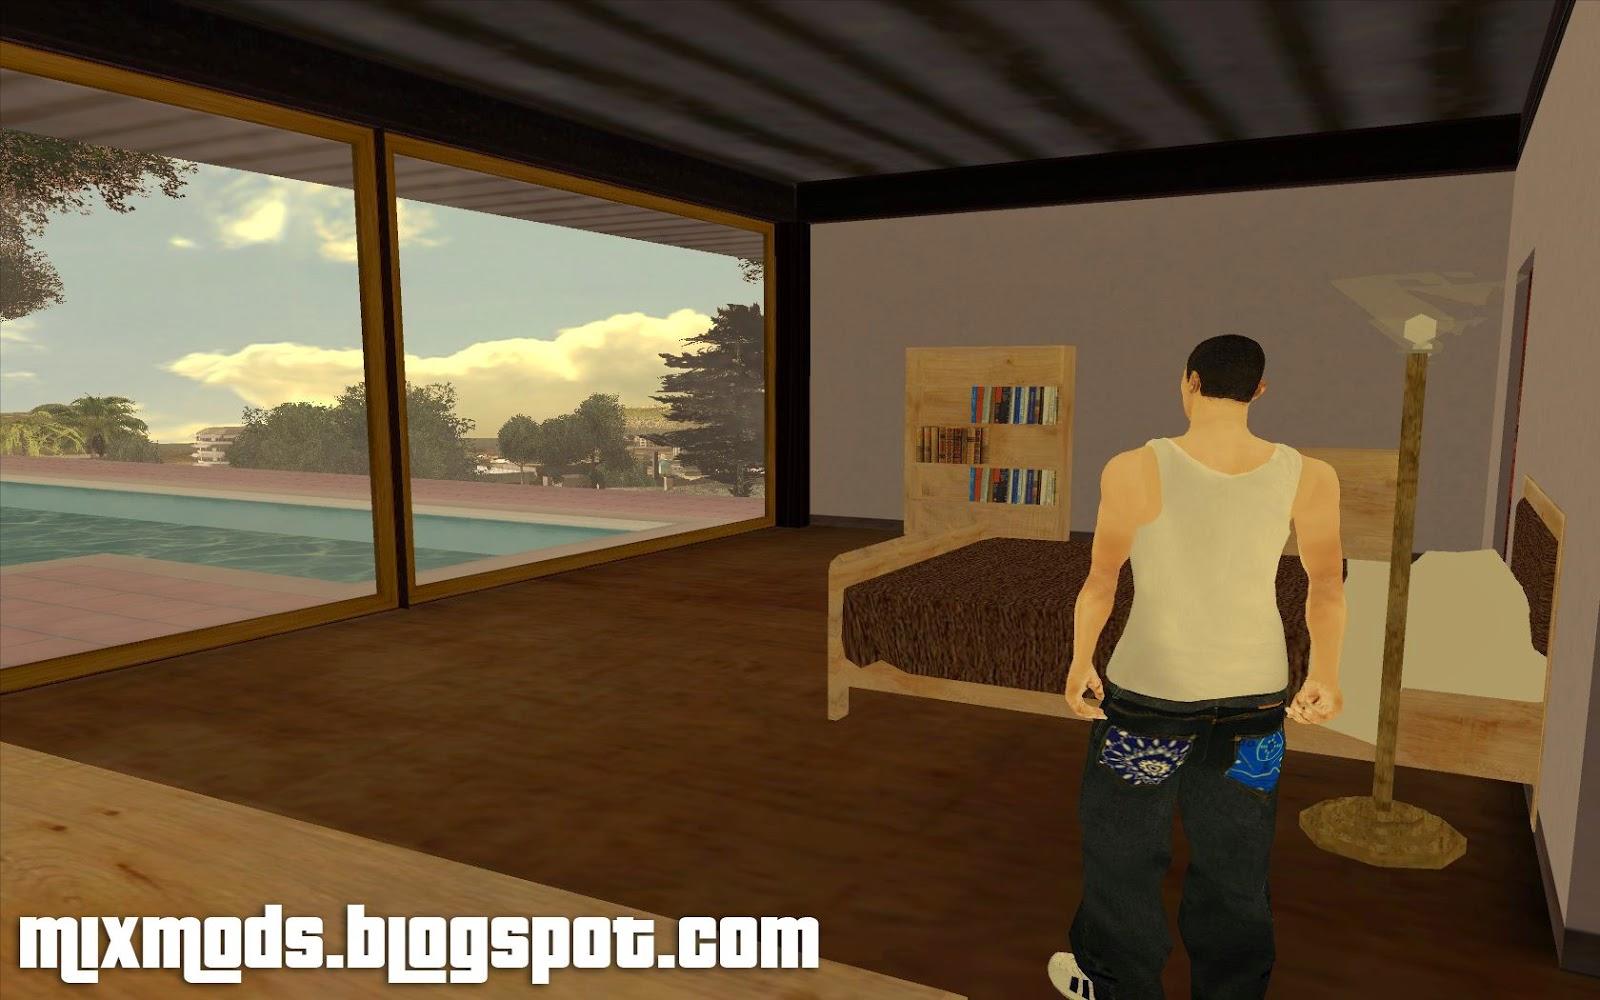 beta mulholland safehouse safe-house gta sa beta mod